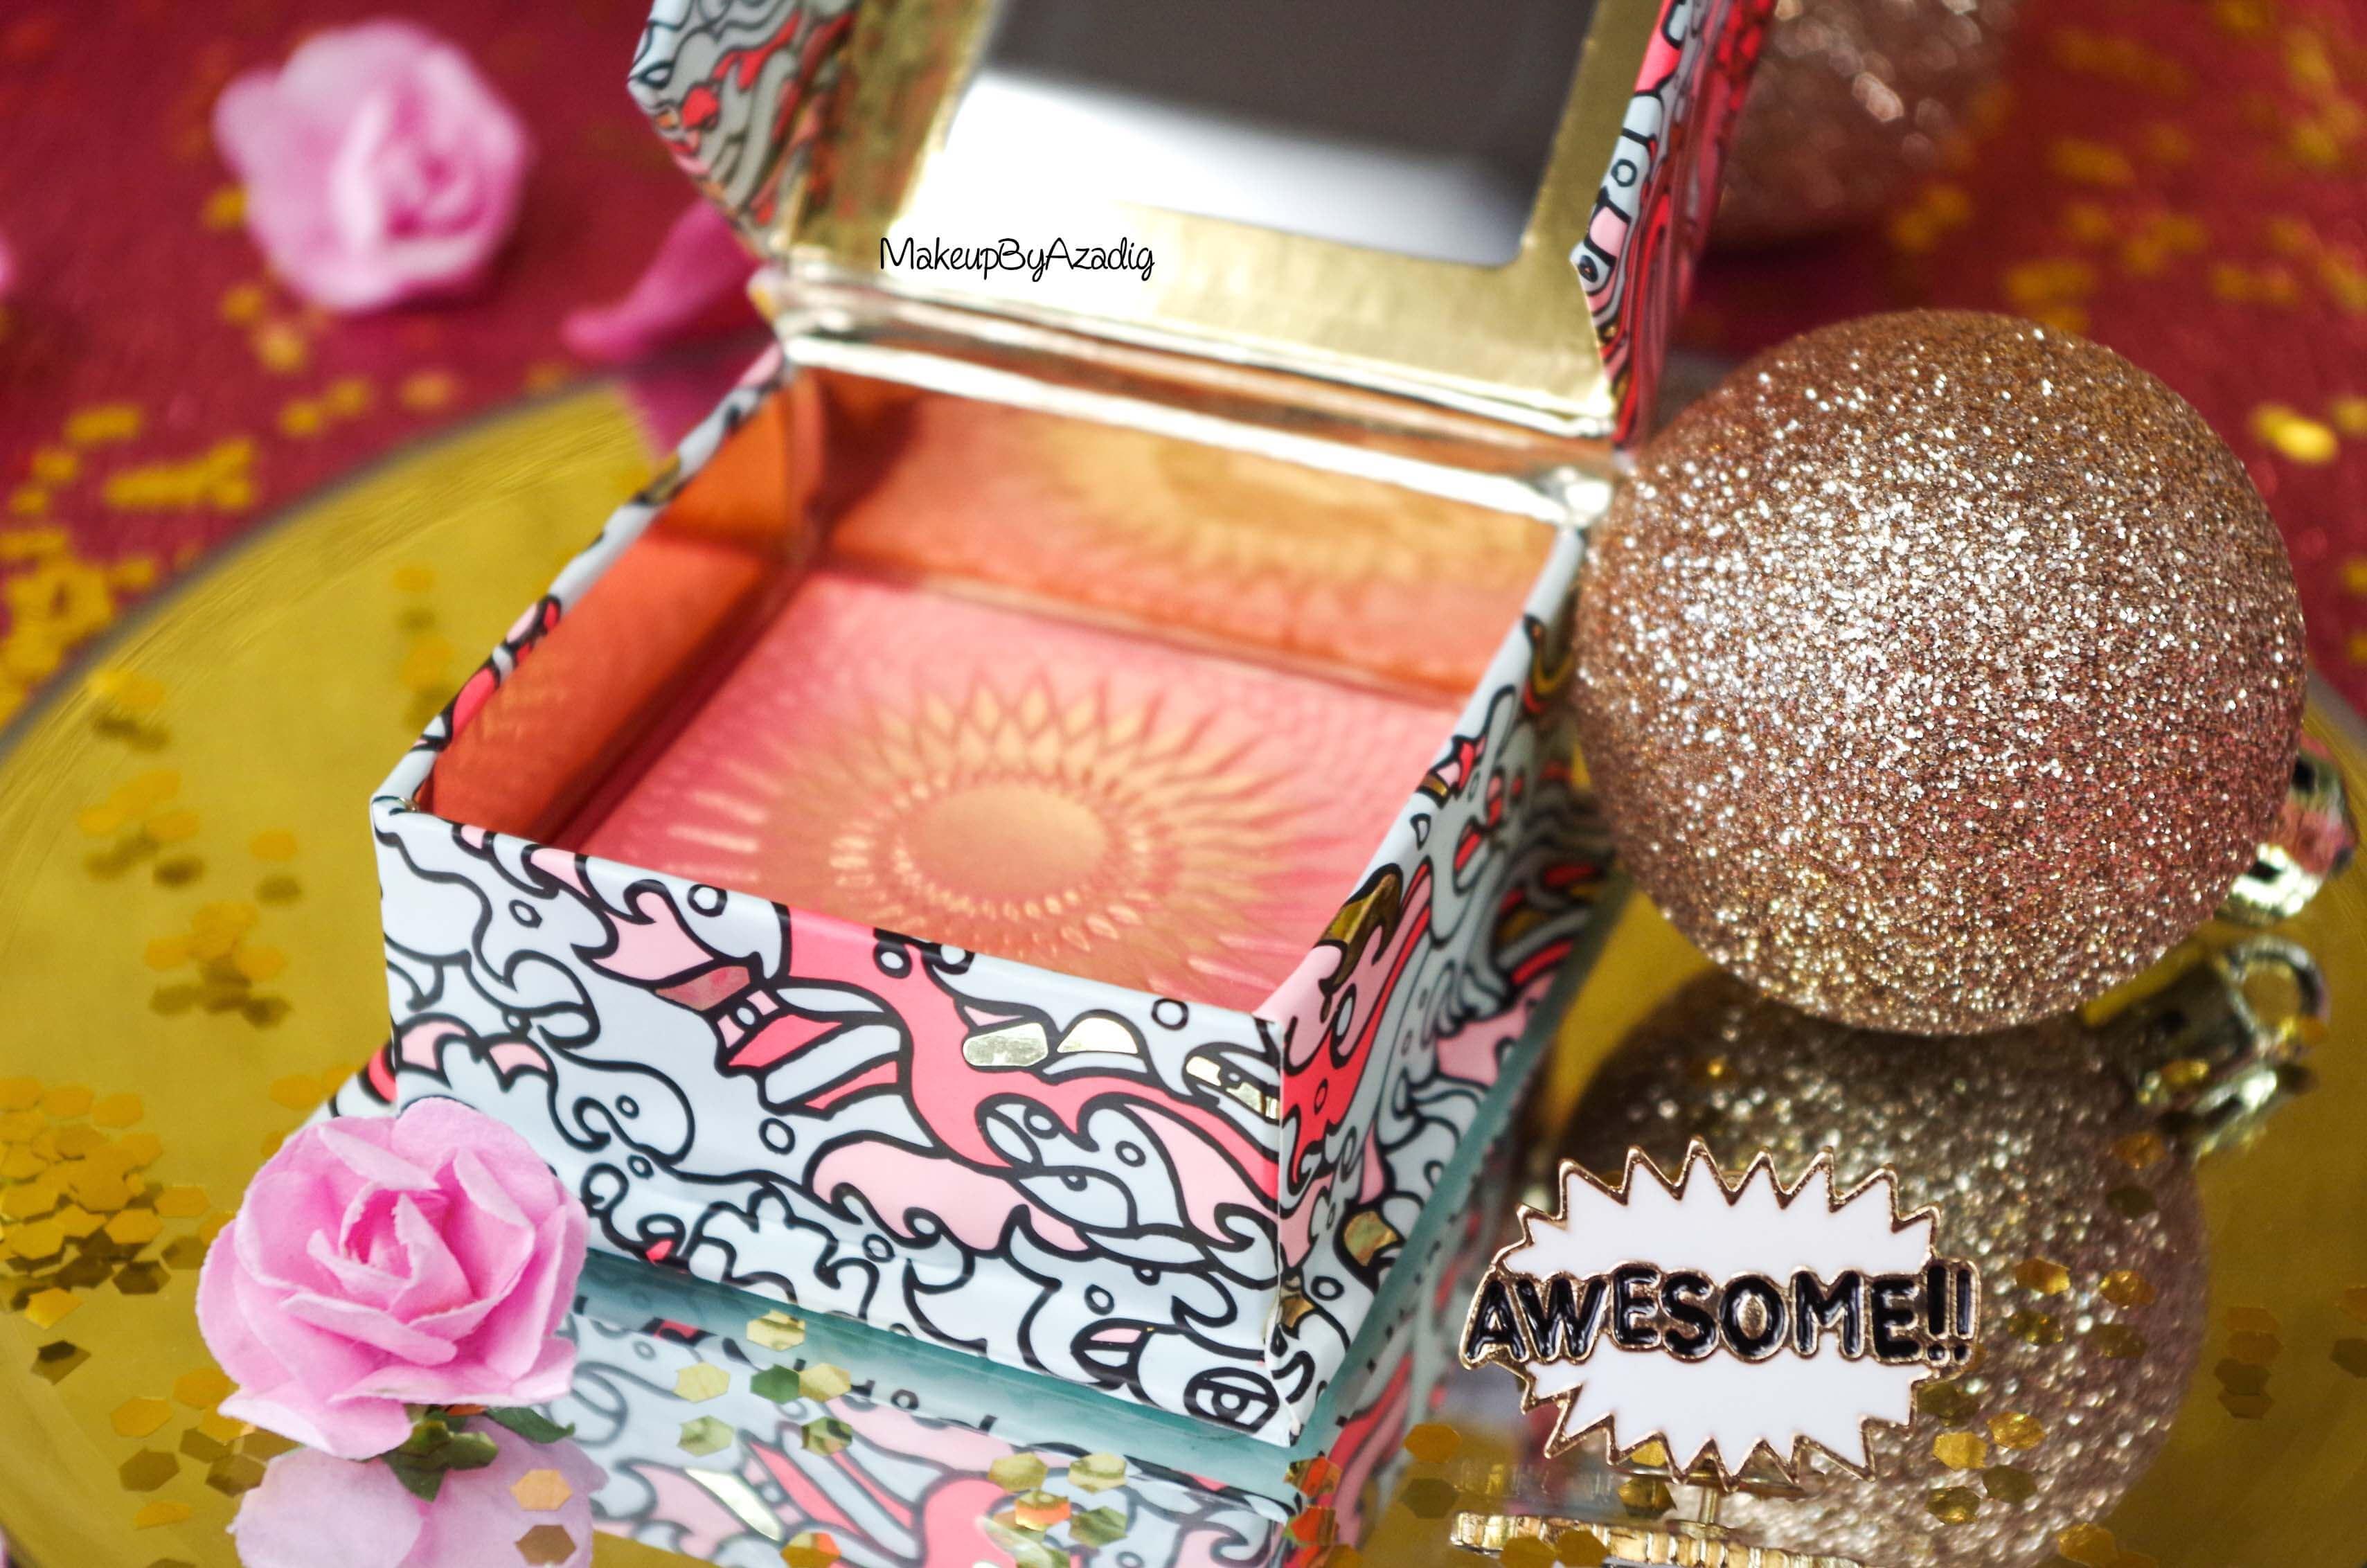 influencer-revue-review-blush-benefit-galifornia-san-francisco-sunny-golden-pink-blush-avis-prix-sephora-makeupbyazadig-coachella